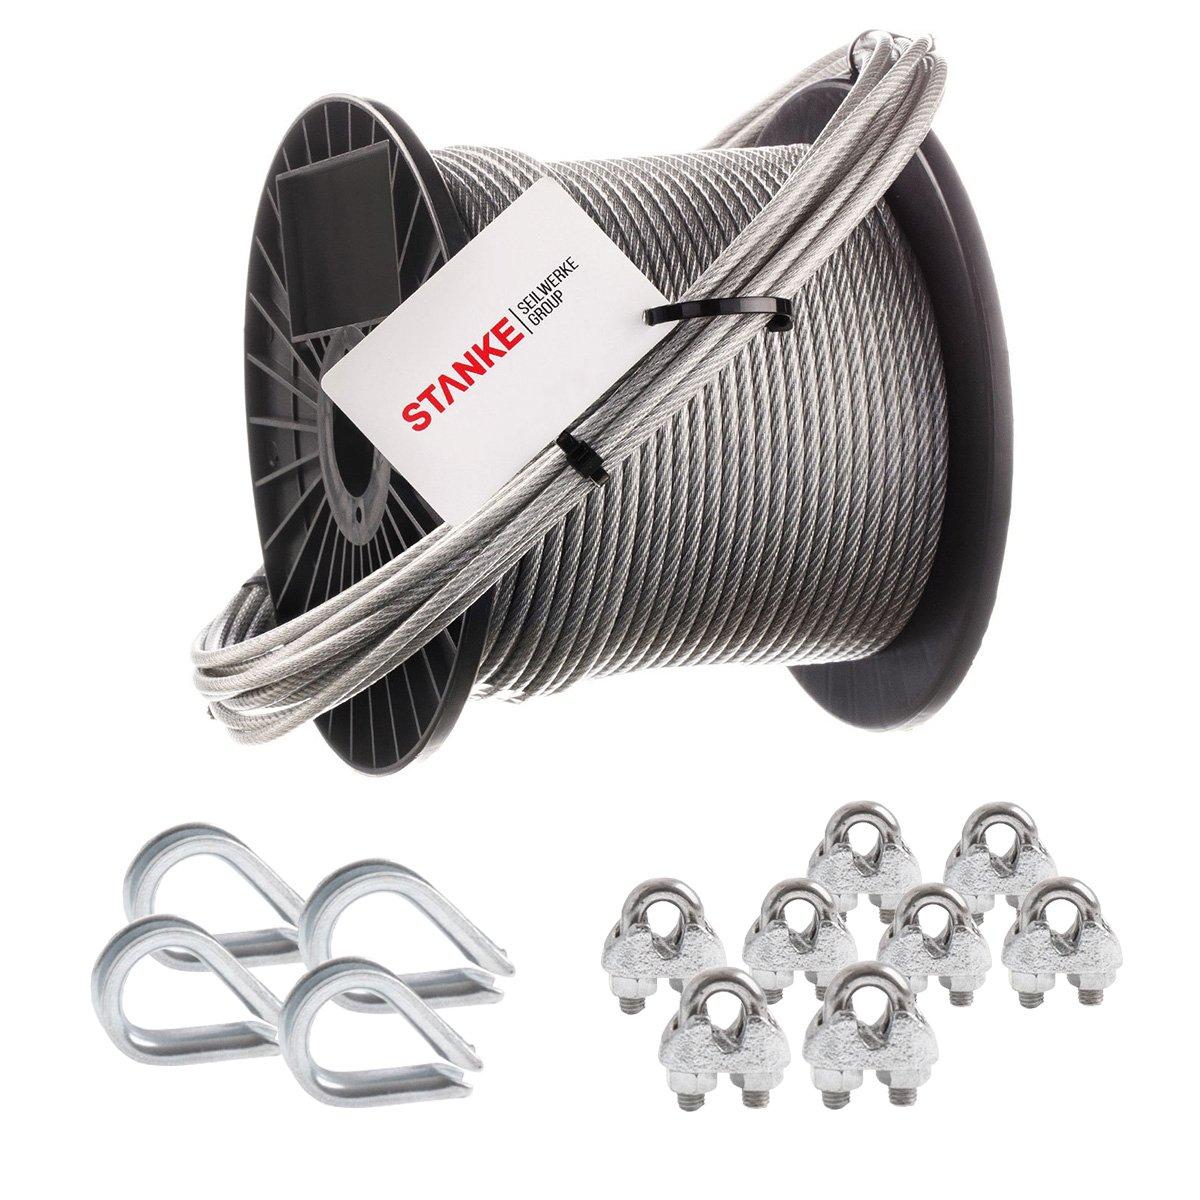 Seilwerk STANKE Rankhilfe PVC Drahtseil ummantelt verzinkt 20m Stahlseil 3mm 6x7, 4x Kausche, 8x Bü gelformklemme - SET 2